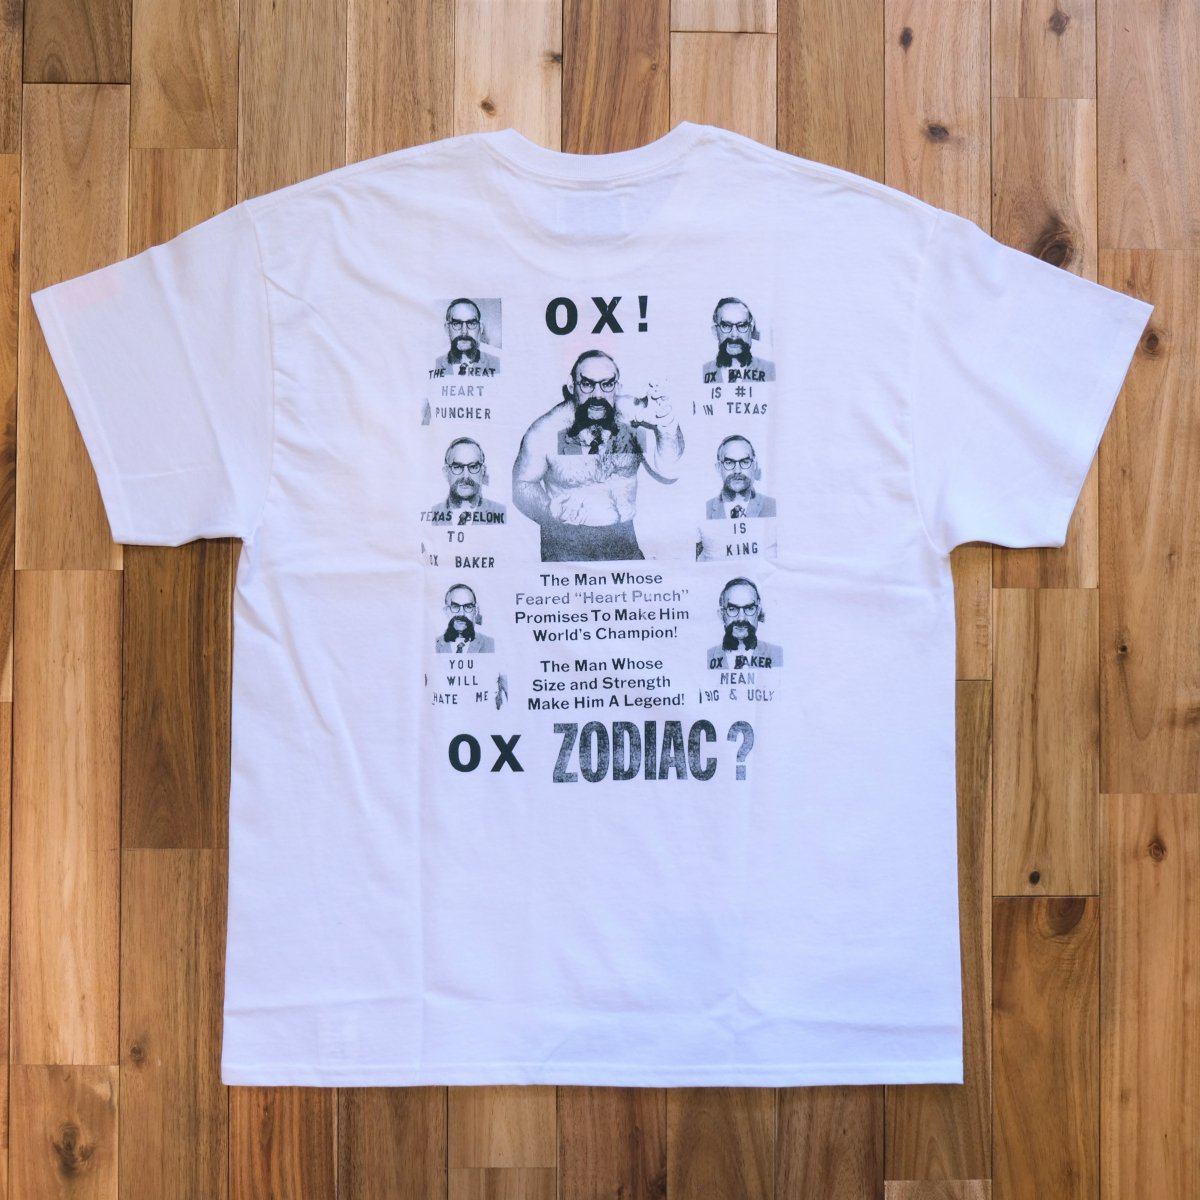 <img class='new_mark_img1' src='https://img.shop-pro.jp/img/new/icons3.gif' style='border:none;display:inline;margin:0px;padding:0px;width:auto;' />Black Weirdos  ブラック ウィドー / Tシャツ OX Tee 【WHITE】